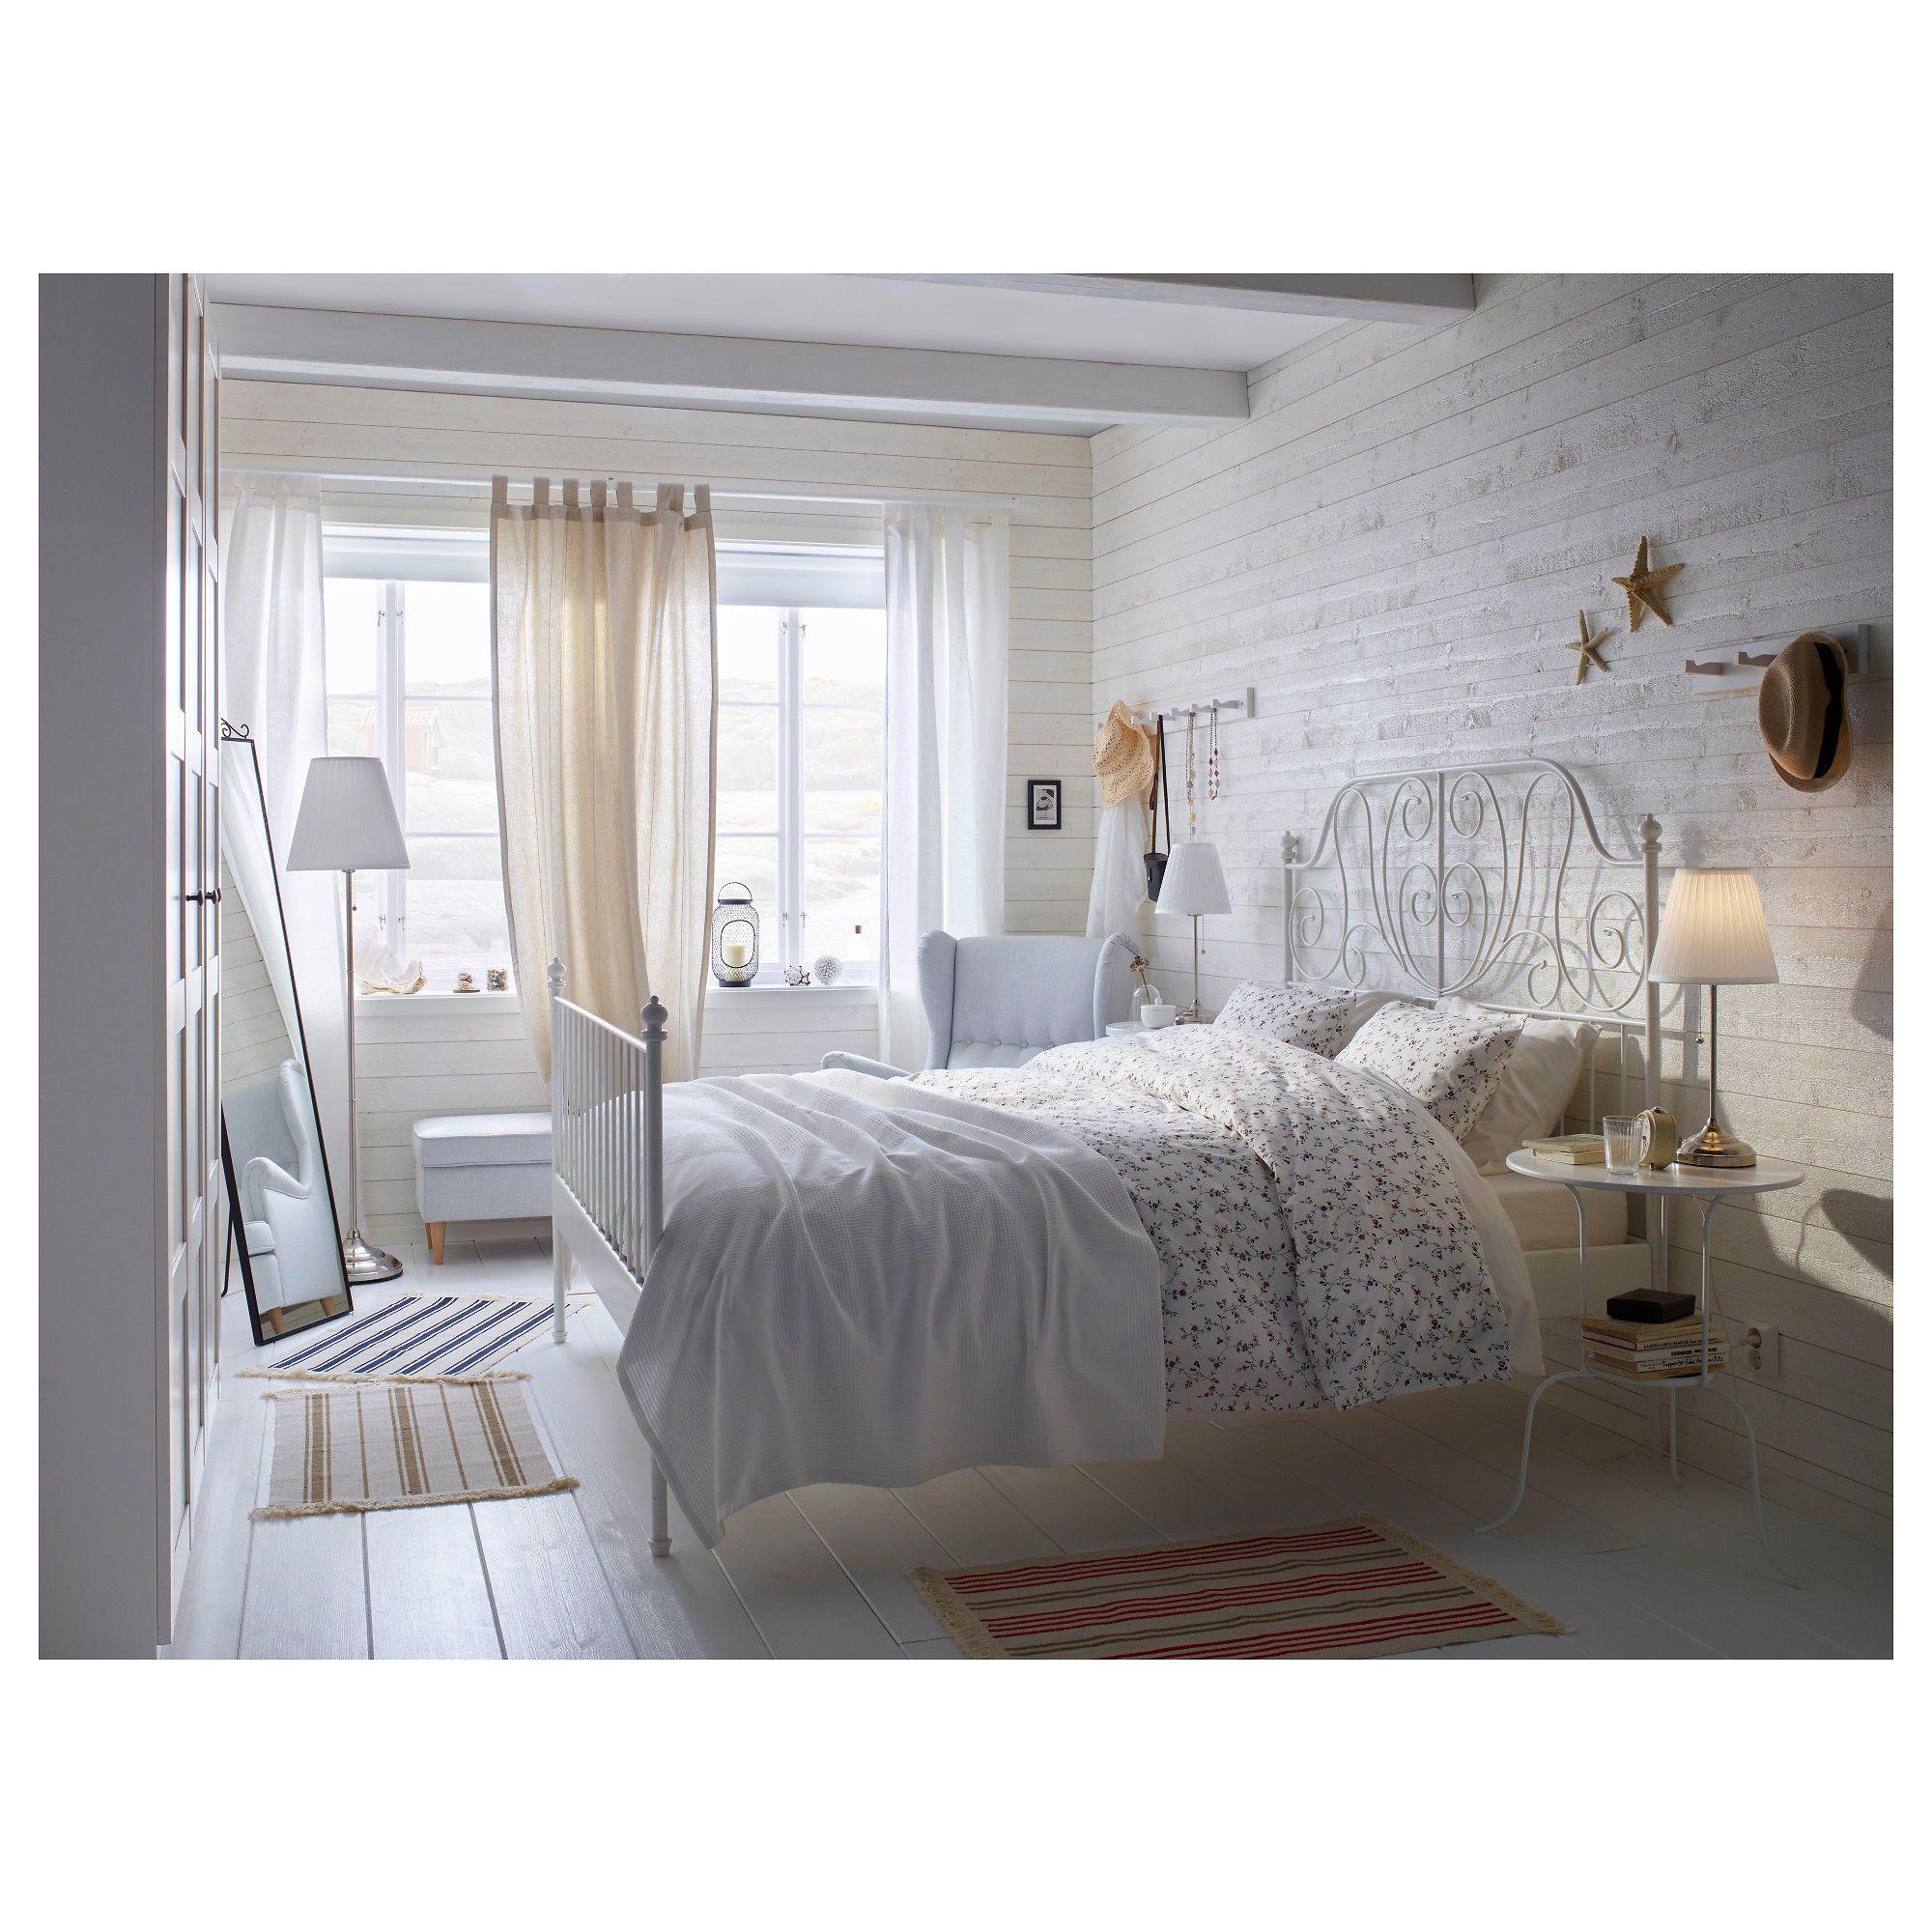 Ikea Bedroom Leirvik Hemnes Is Creative Inspiration For Us: IKEA - LEIRVIK Bed Frame White, Eidfjord